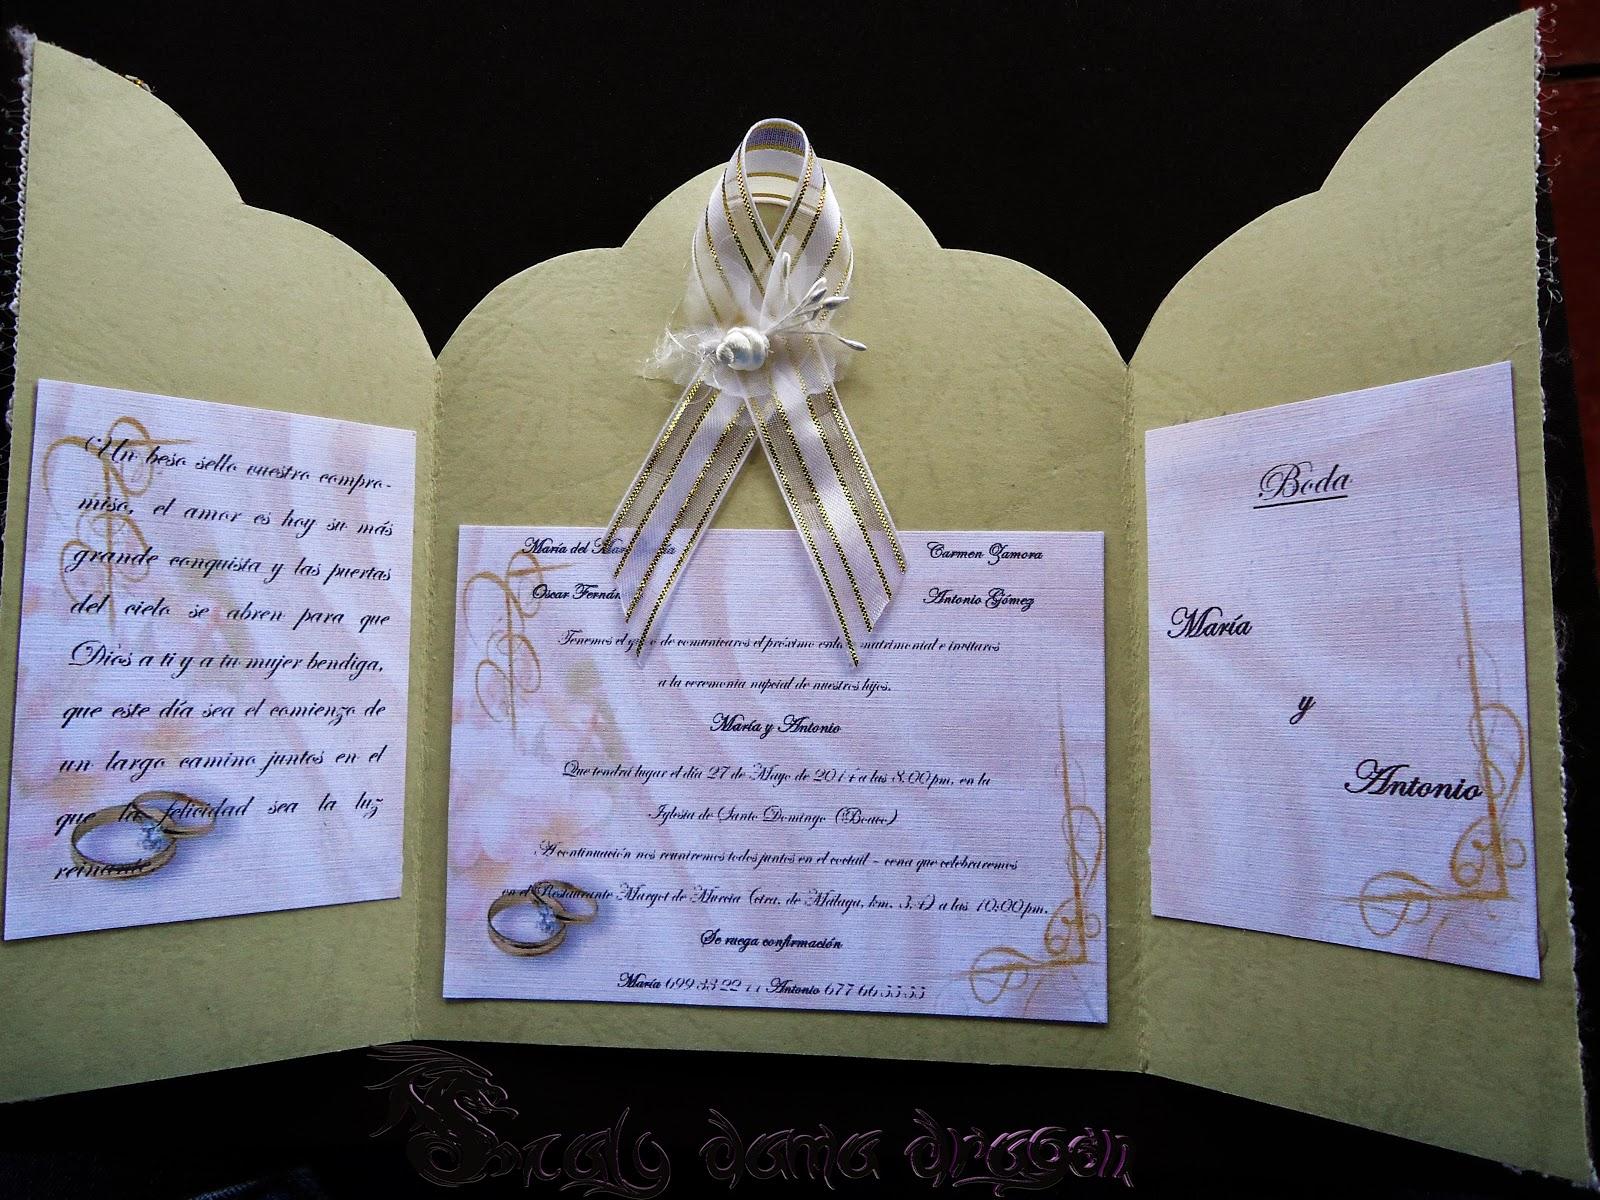 Tarjeta o invitaci n para boda dise o puertas al altar - Disenos tarjetas de boda ...